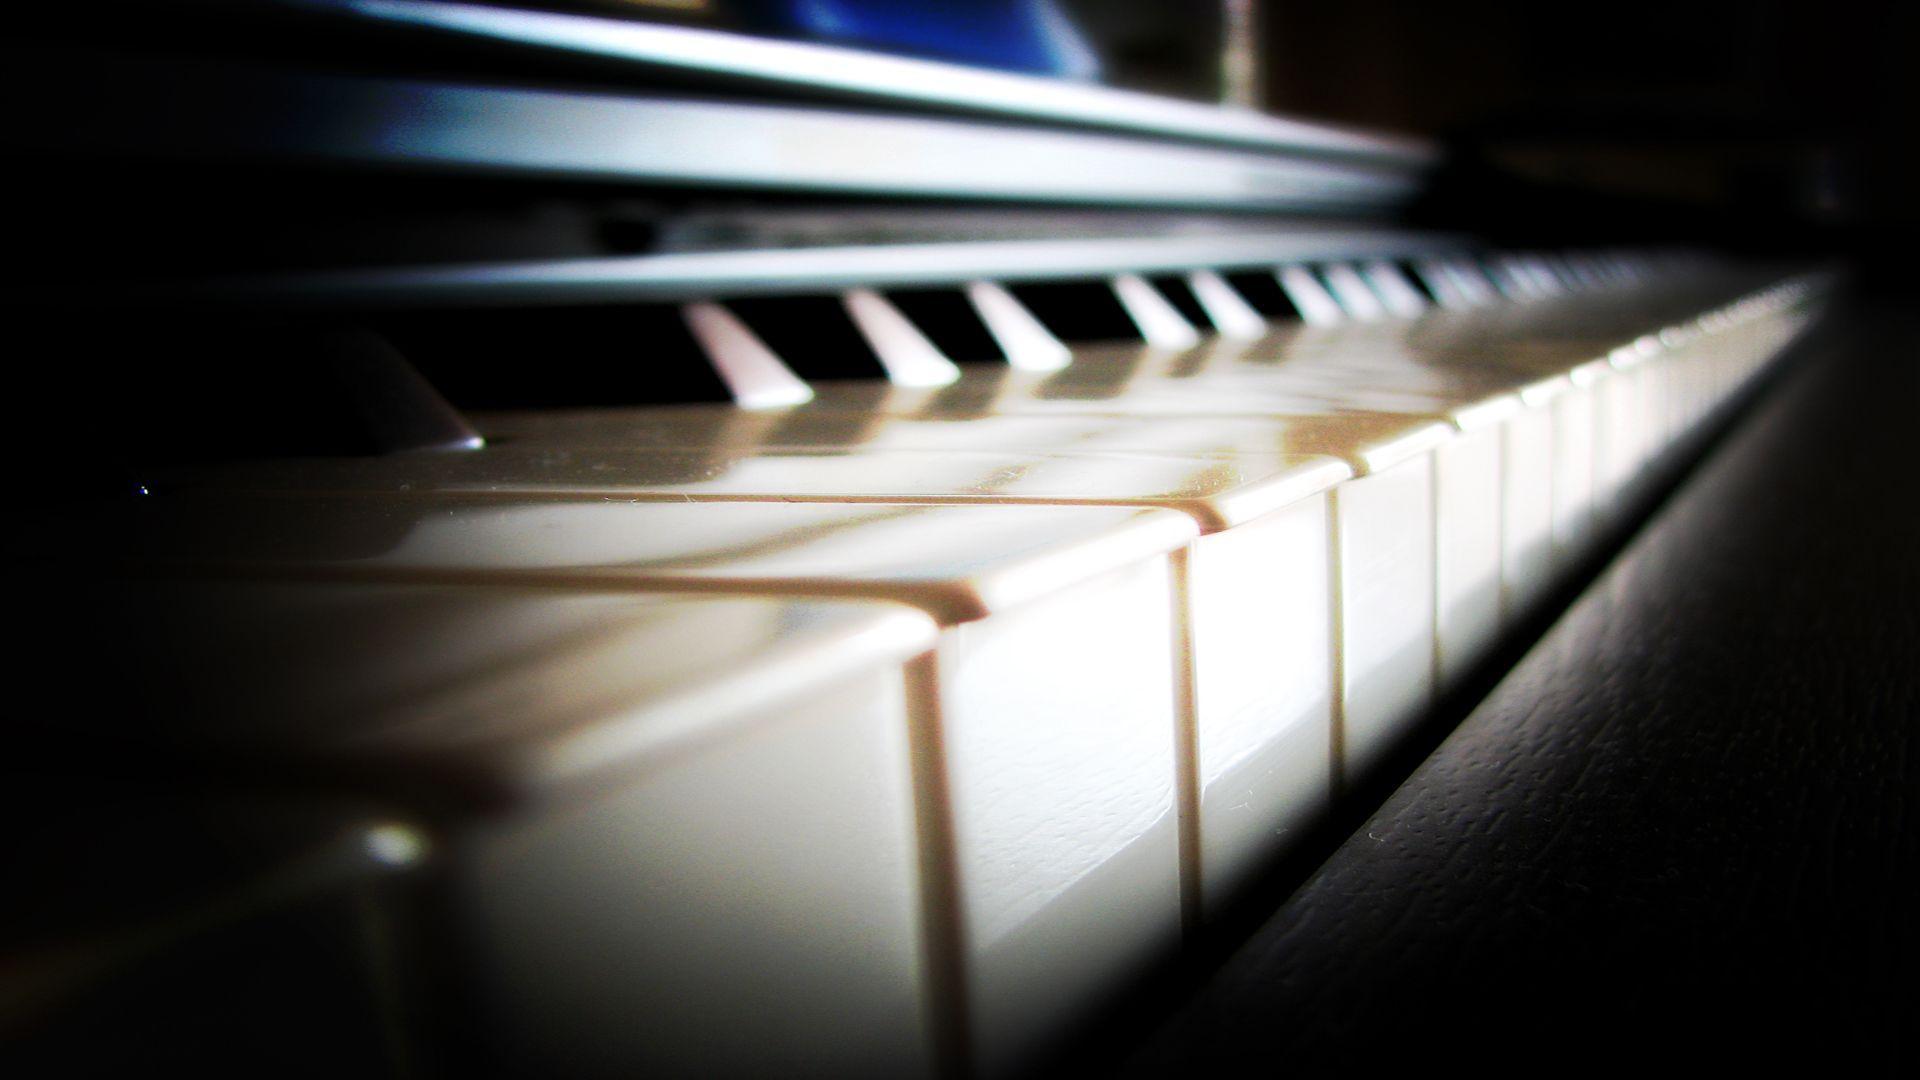 Piano Keys Wallpapers - Wallpaper Cave